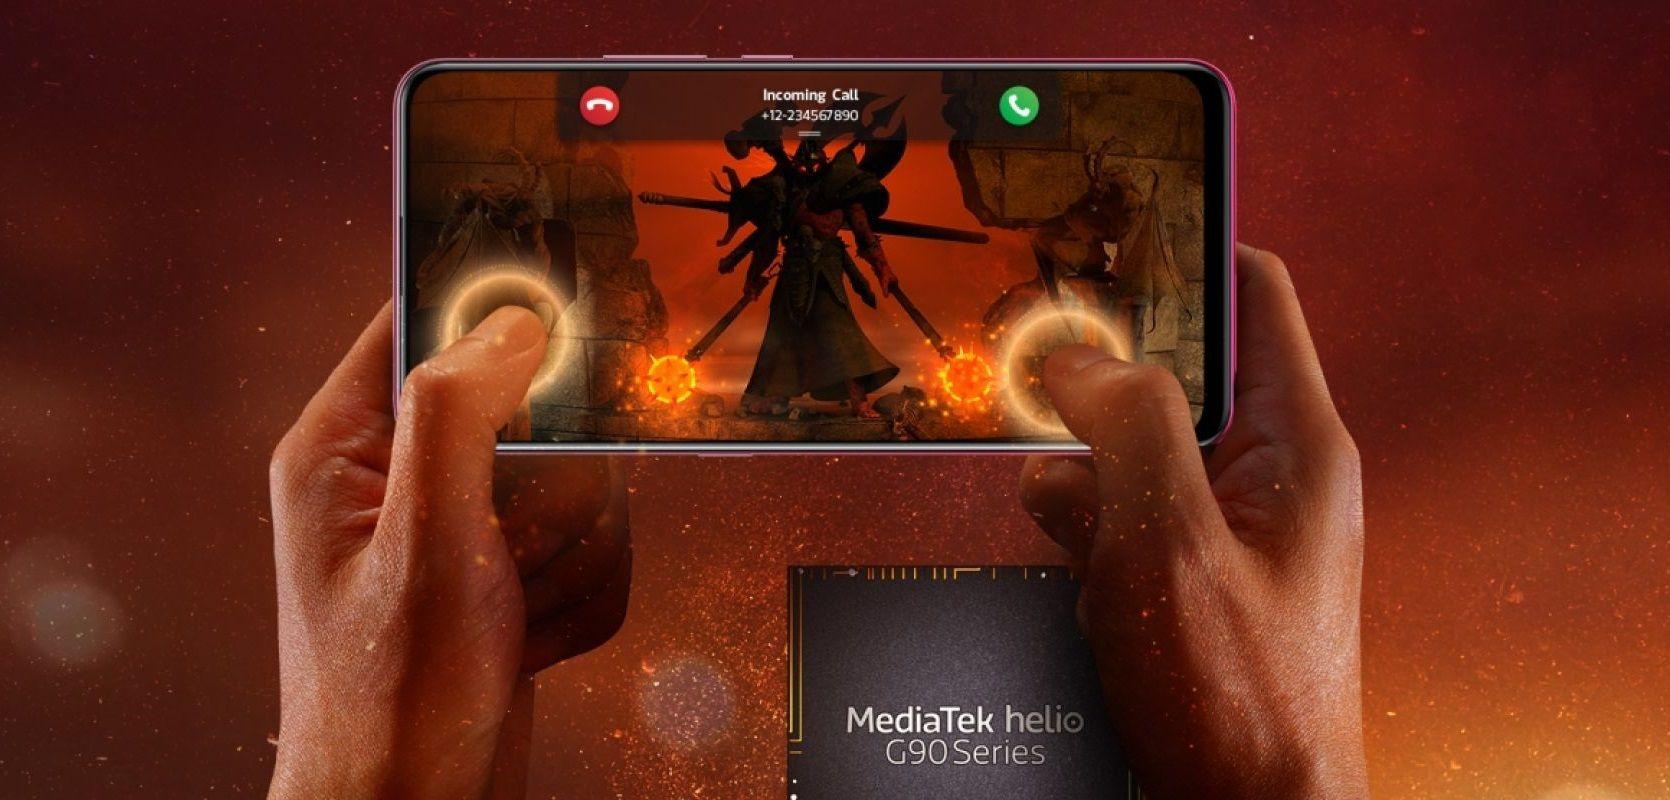 MediaTek Helio G90、Helio G90Tを発表。高性能なCPUやGPUを搭載したゲーミングに重きをおいたプロセッサー